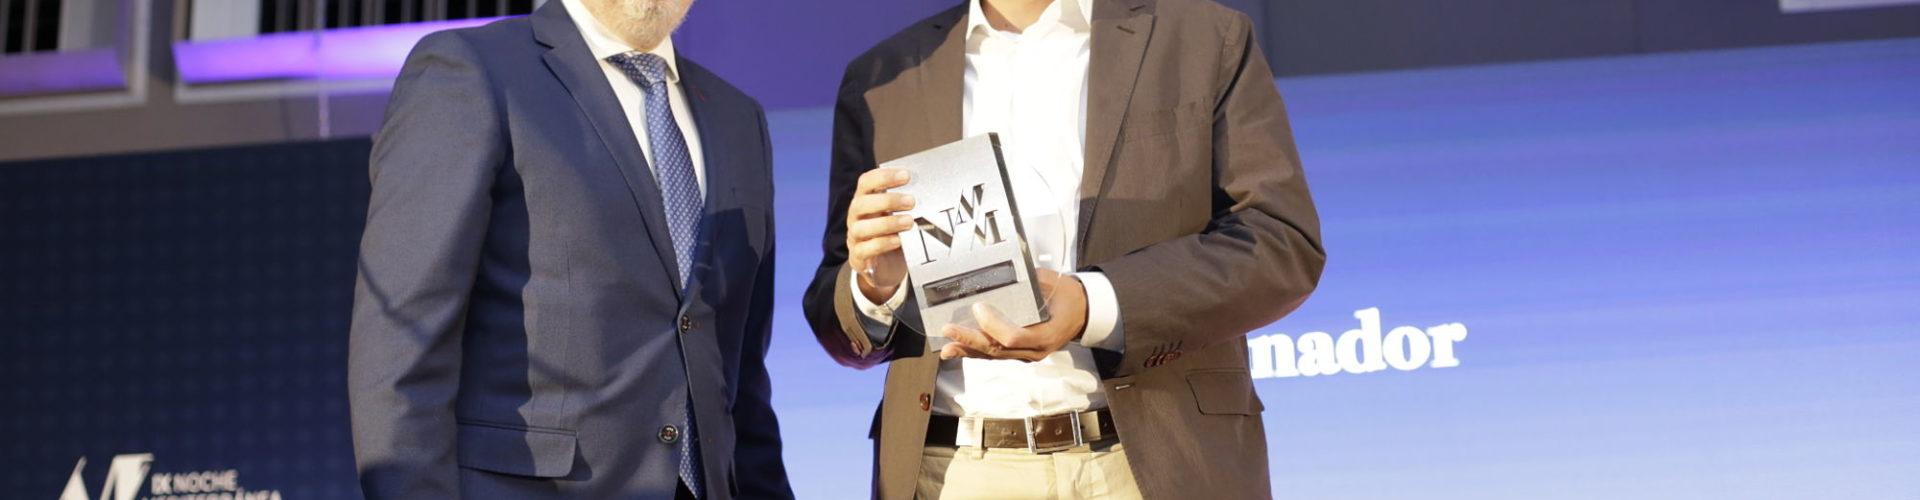 Recogida de premio